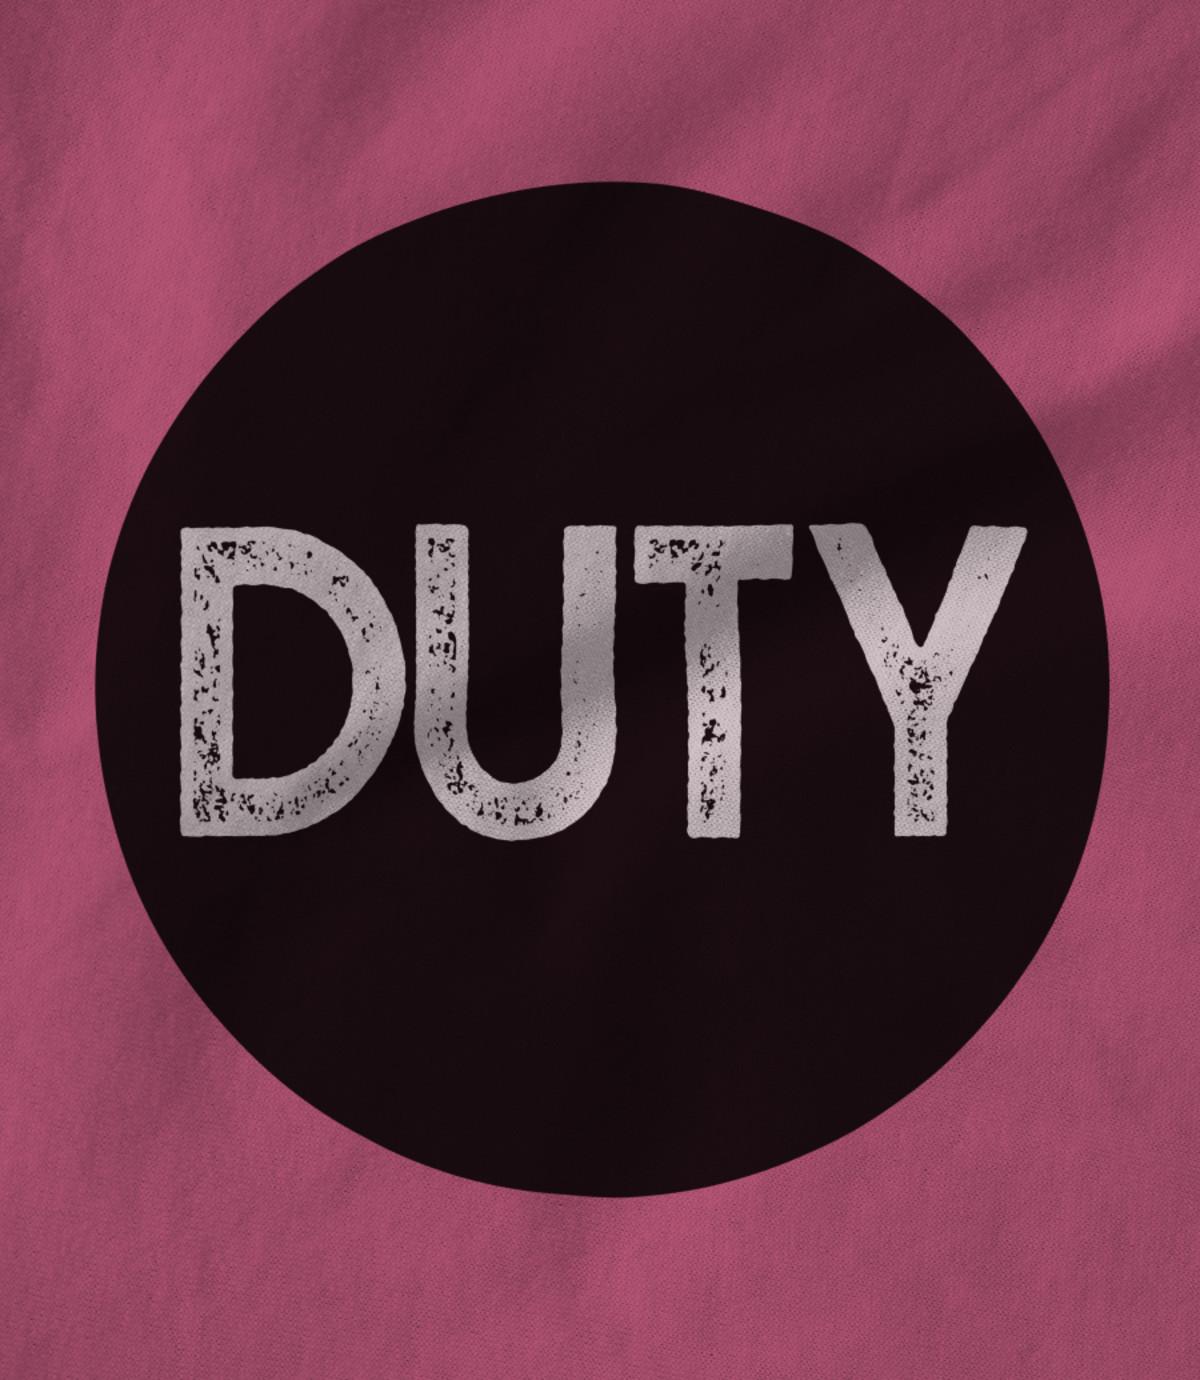 Duty duty circle logo pink 1542364160